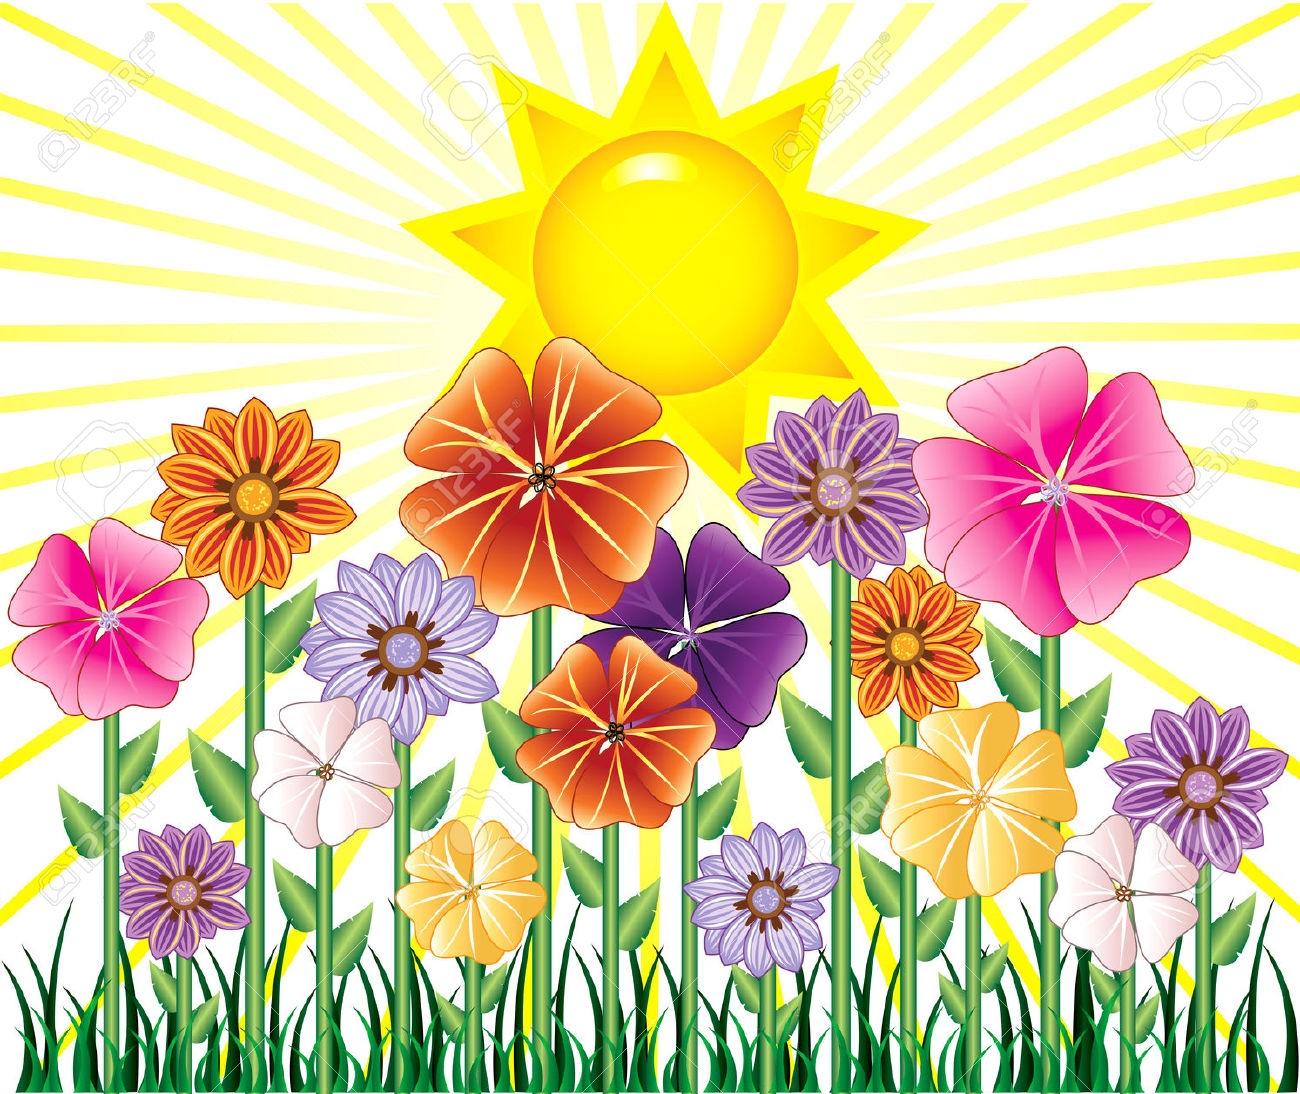 Clipart sunshine scene. Free spring cliparts download